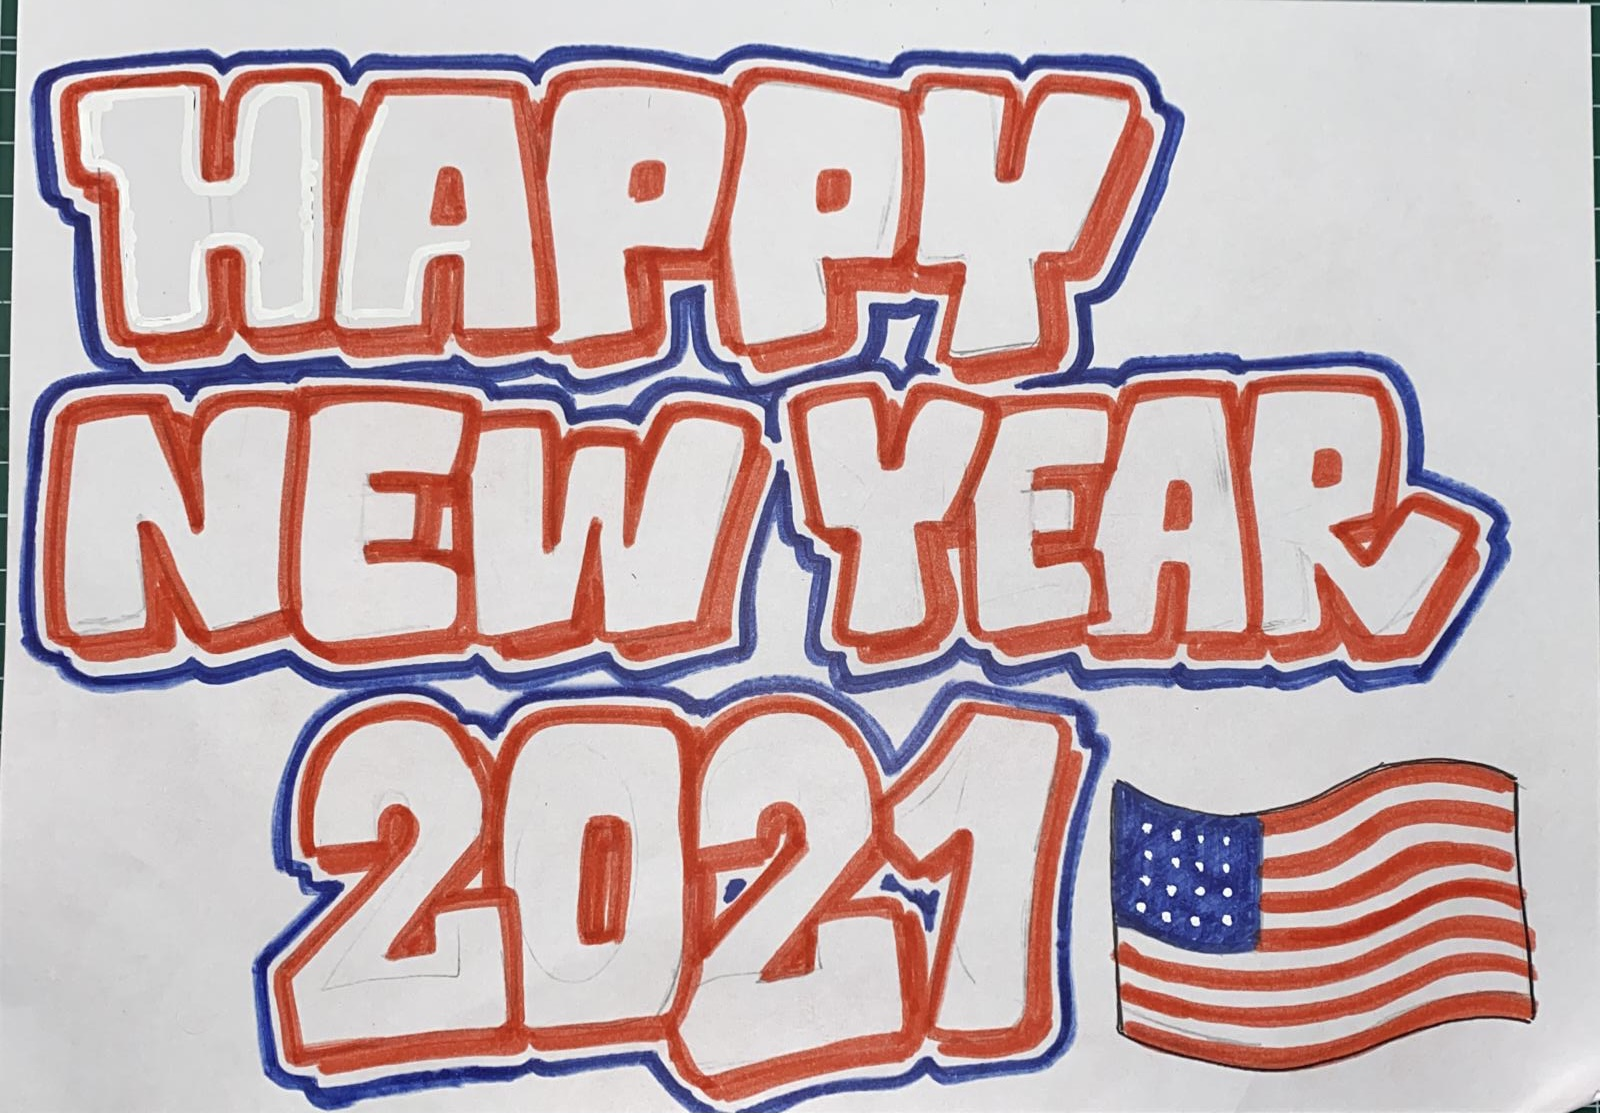 HAPPY NEW YEAR!! 2021